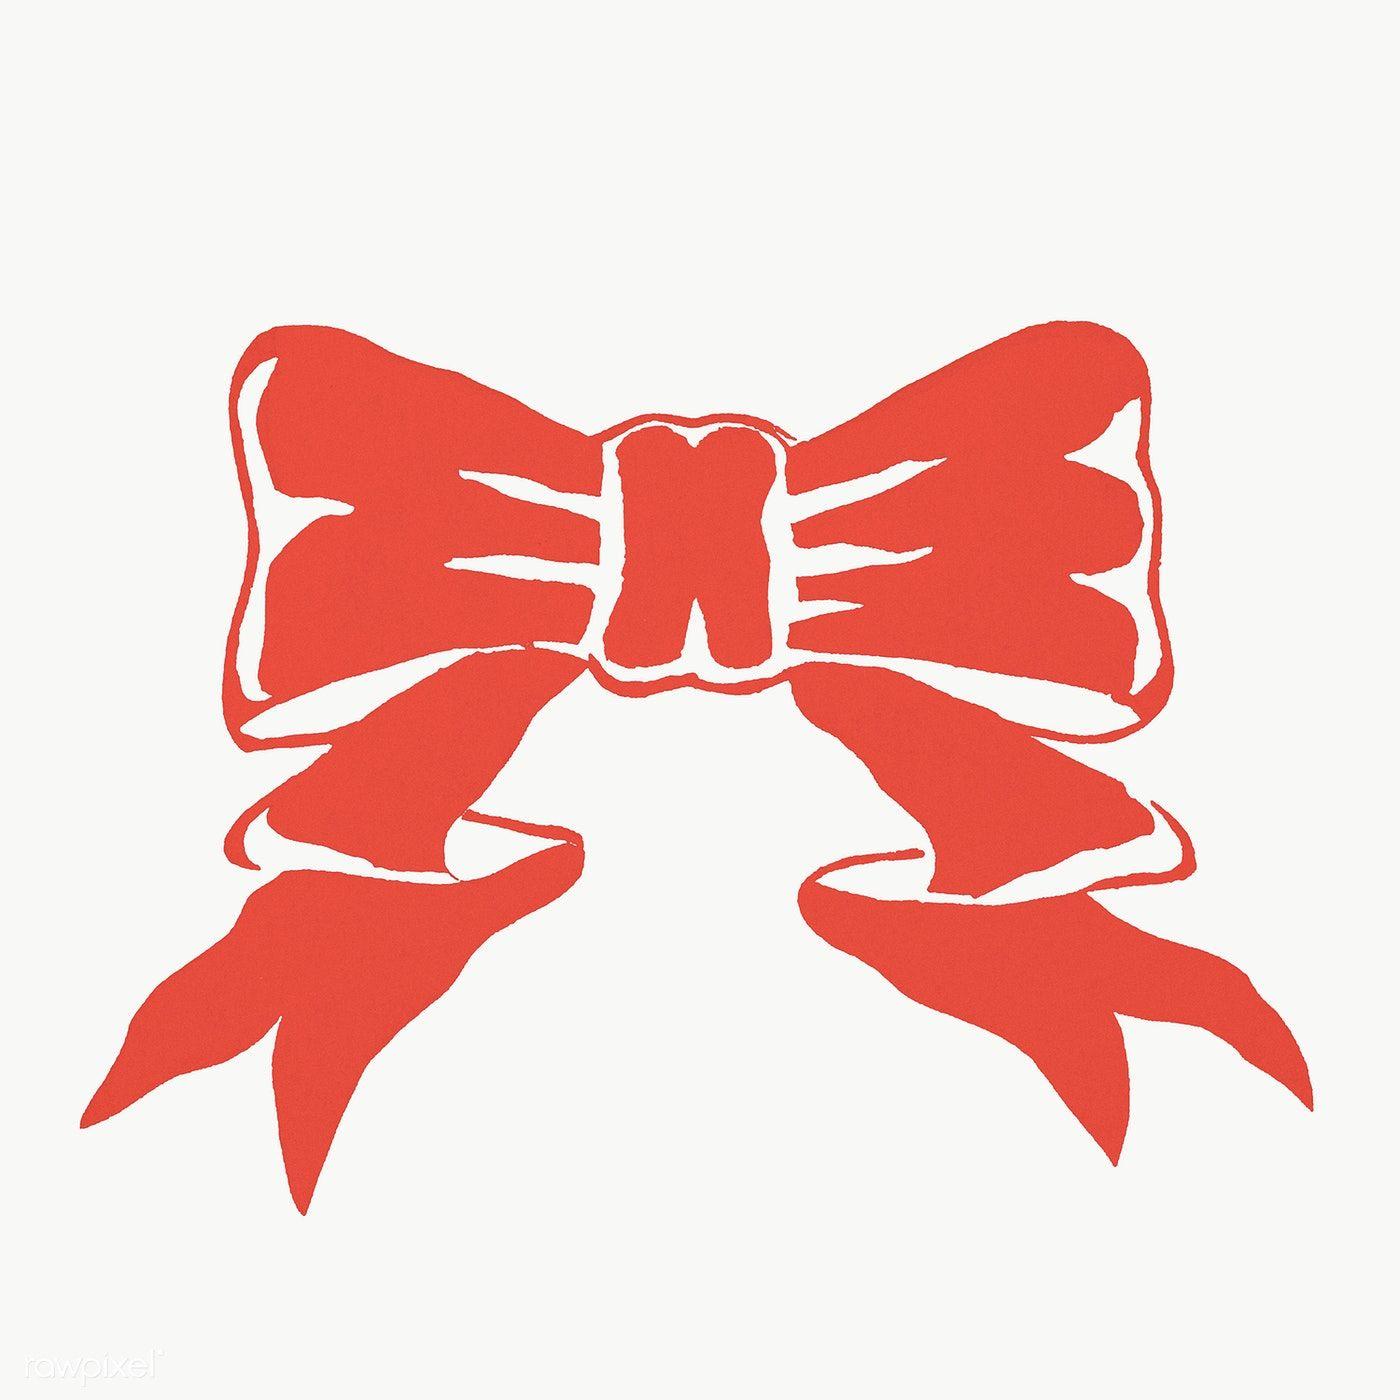 Download Premium Png Of Red Christmas Ribbon Png 1232770 Christmas Ribbon Ribbon Png Merry Christmas Typography